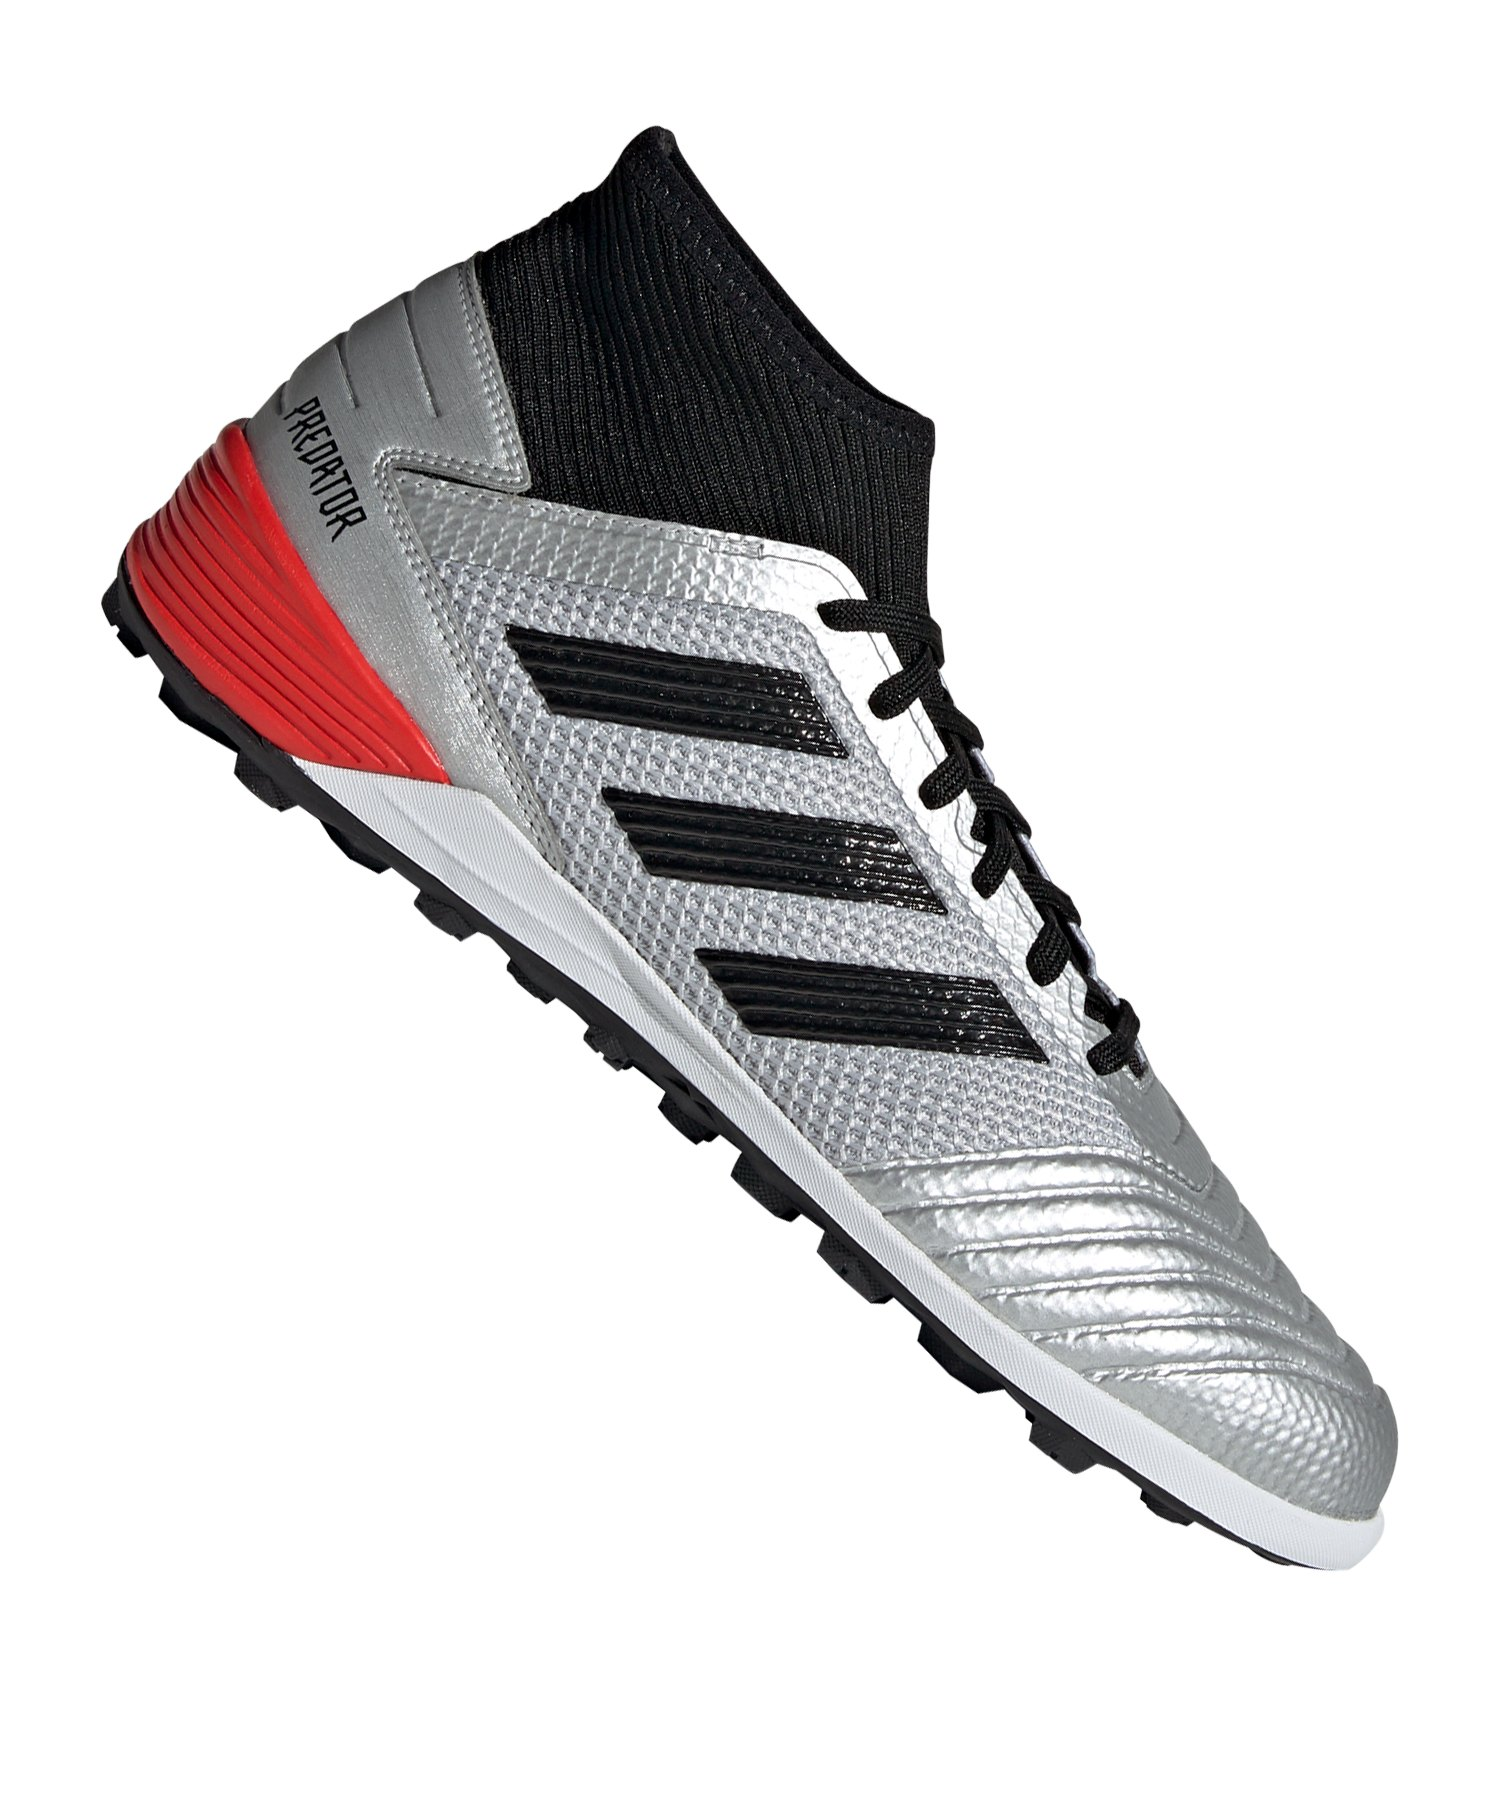 adidas Predator 19.3 TF Silber Schwarz Rot - Silber